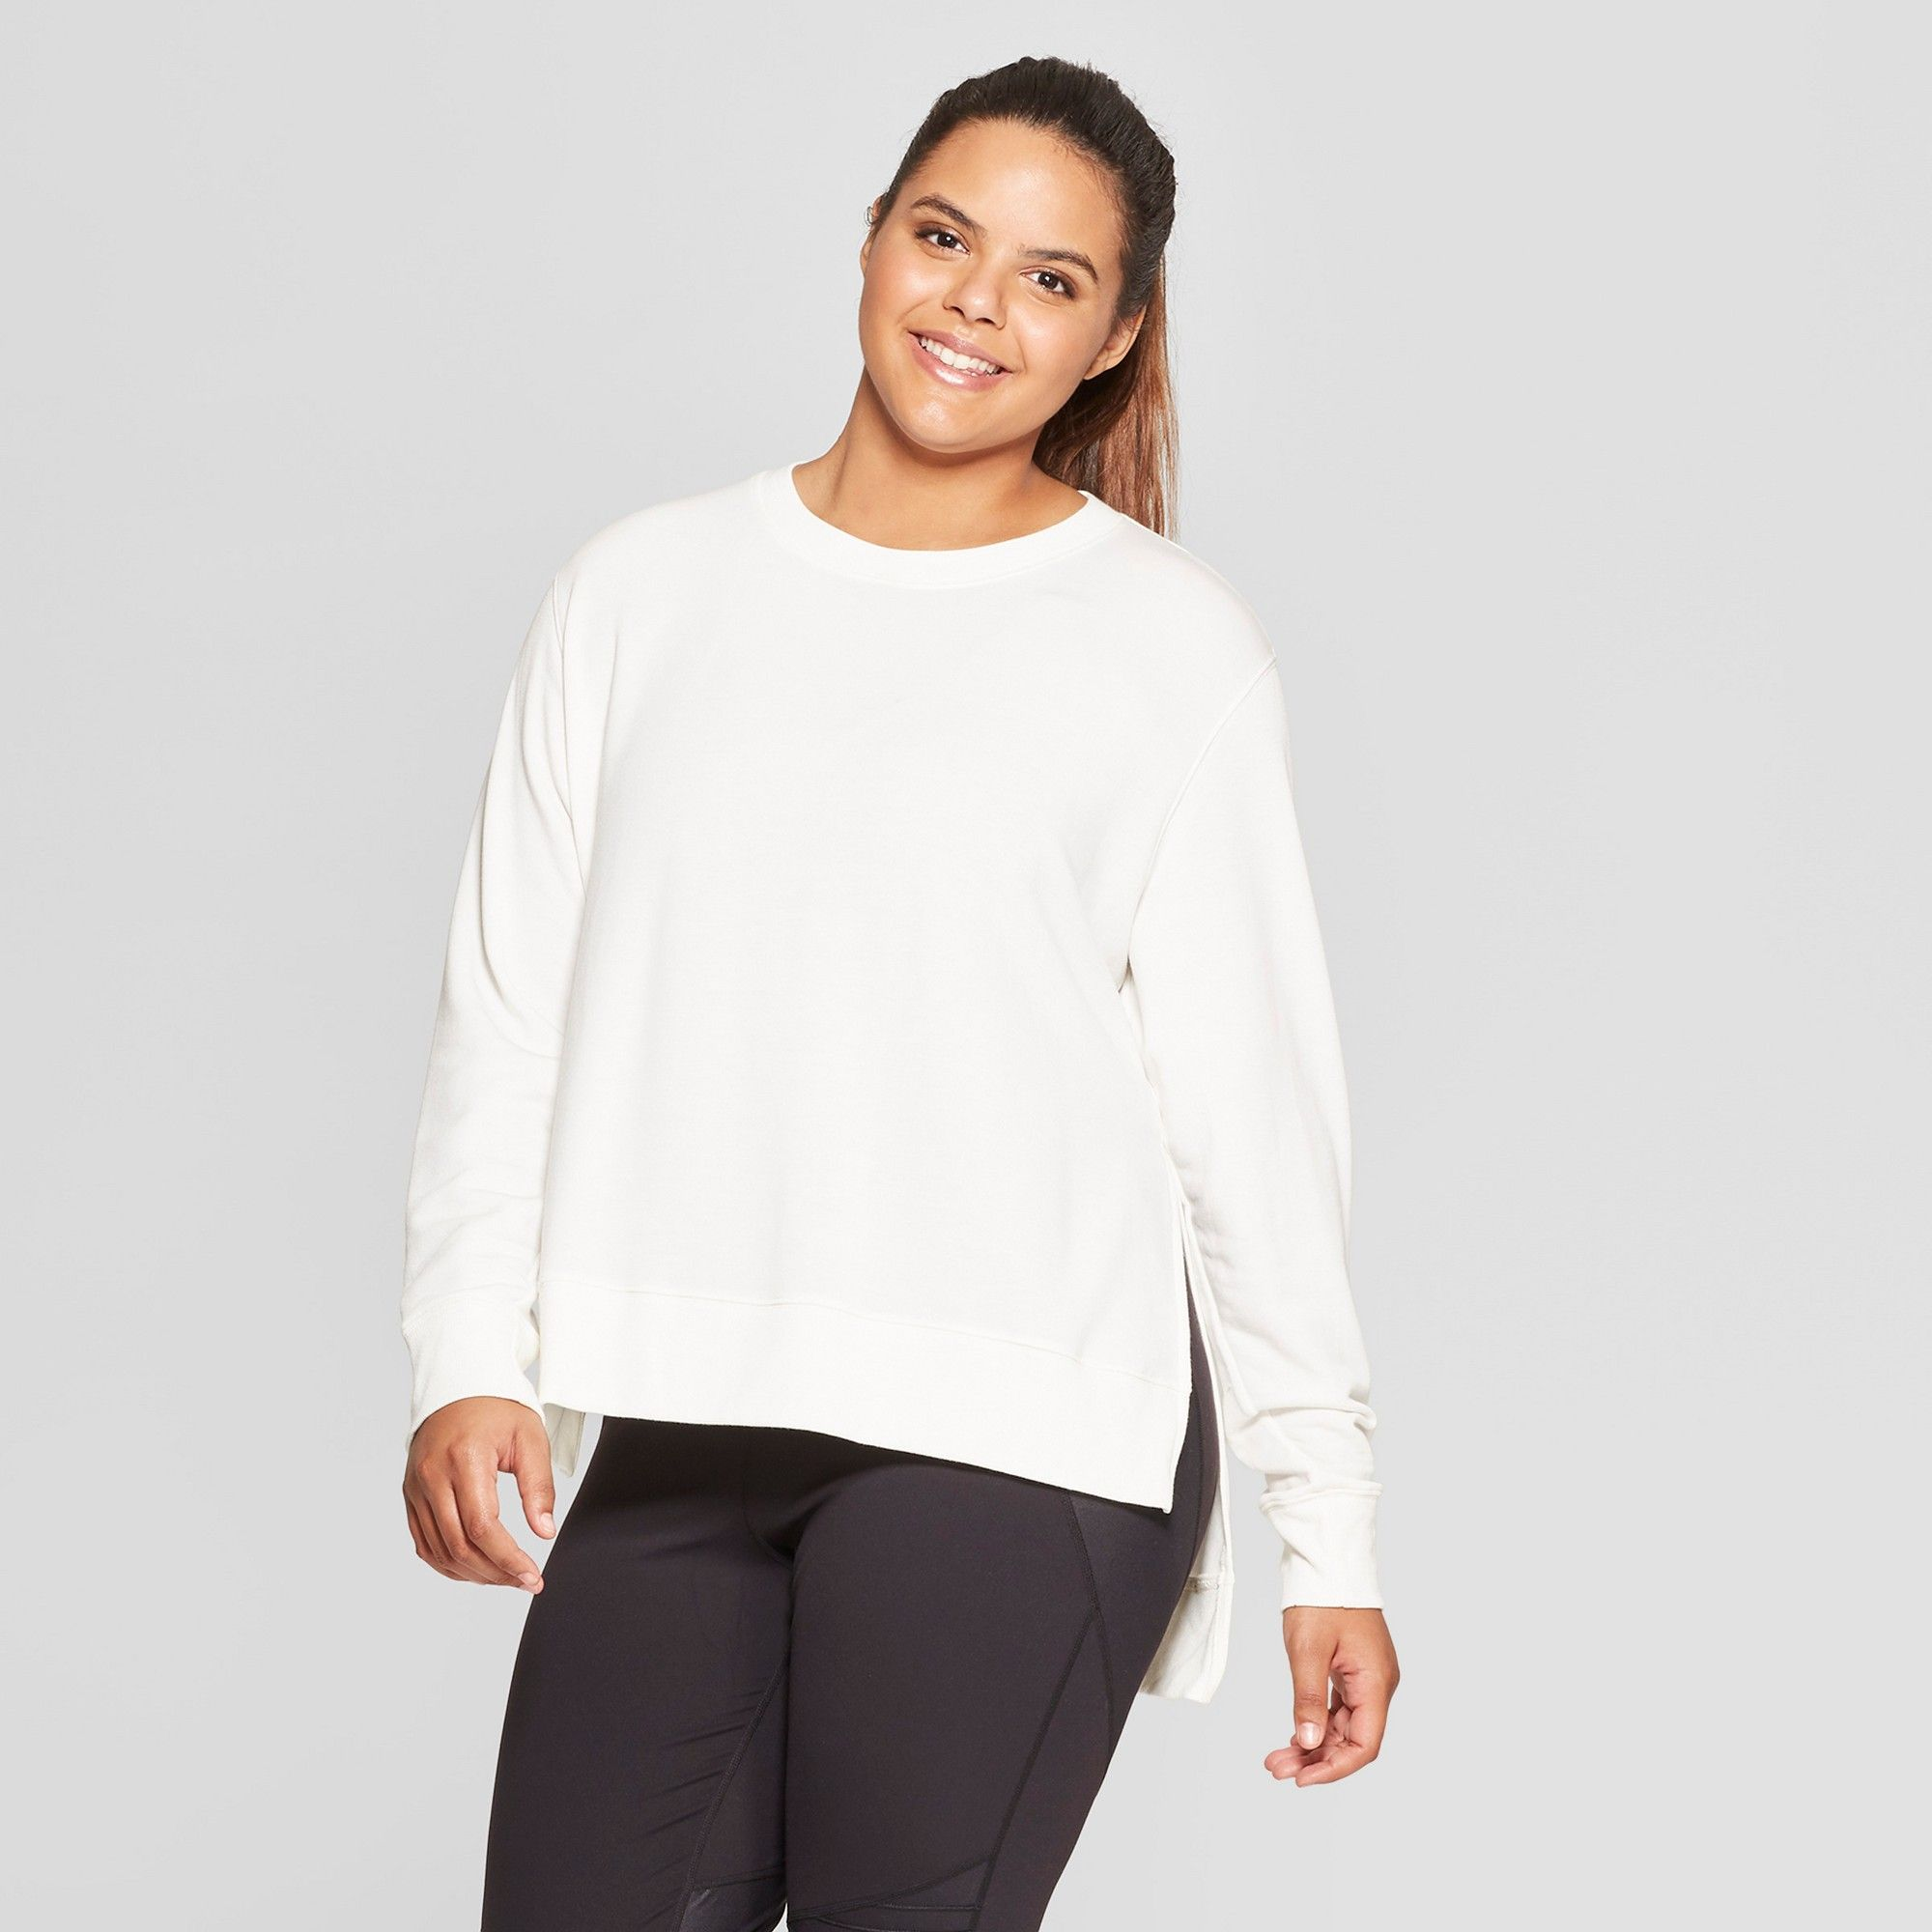 Women's Plus Size Crewneck Sweatshirt JoyLab Ivory 2X